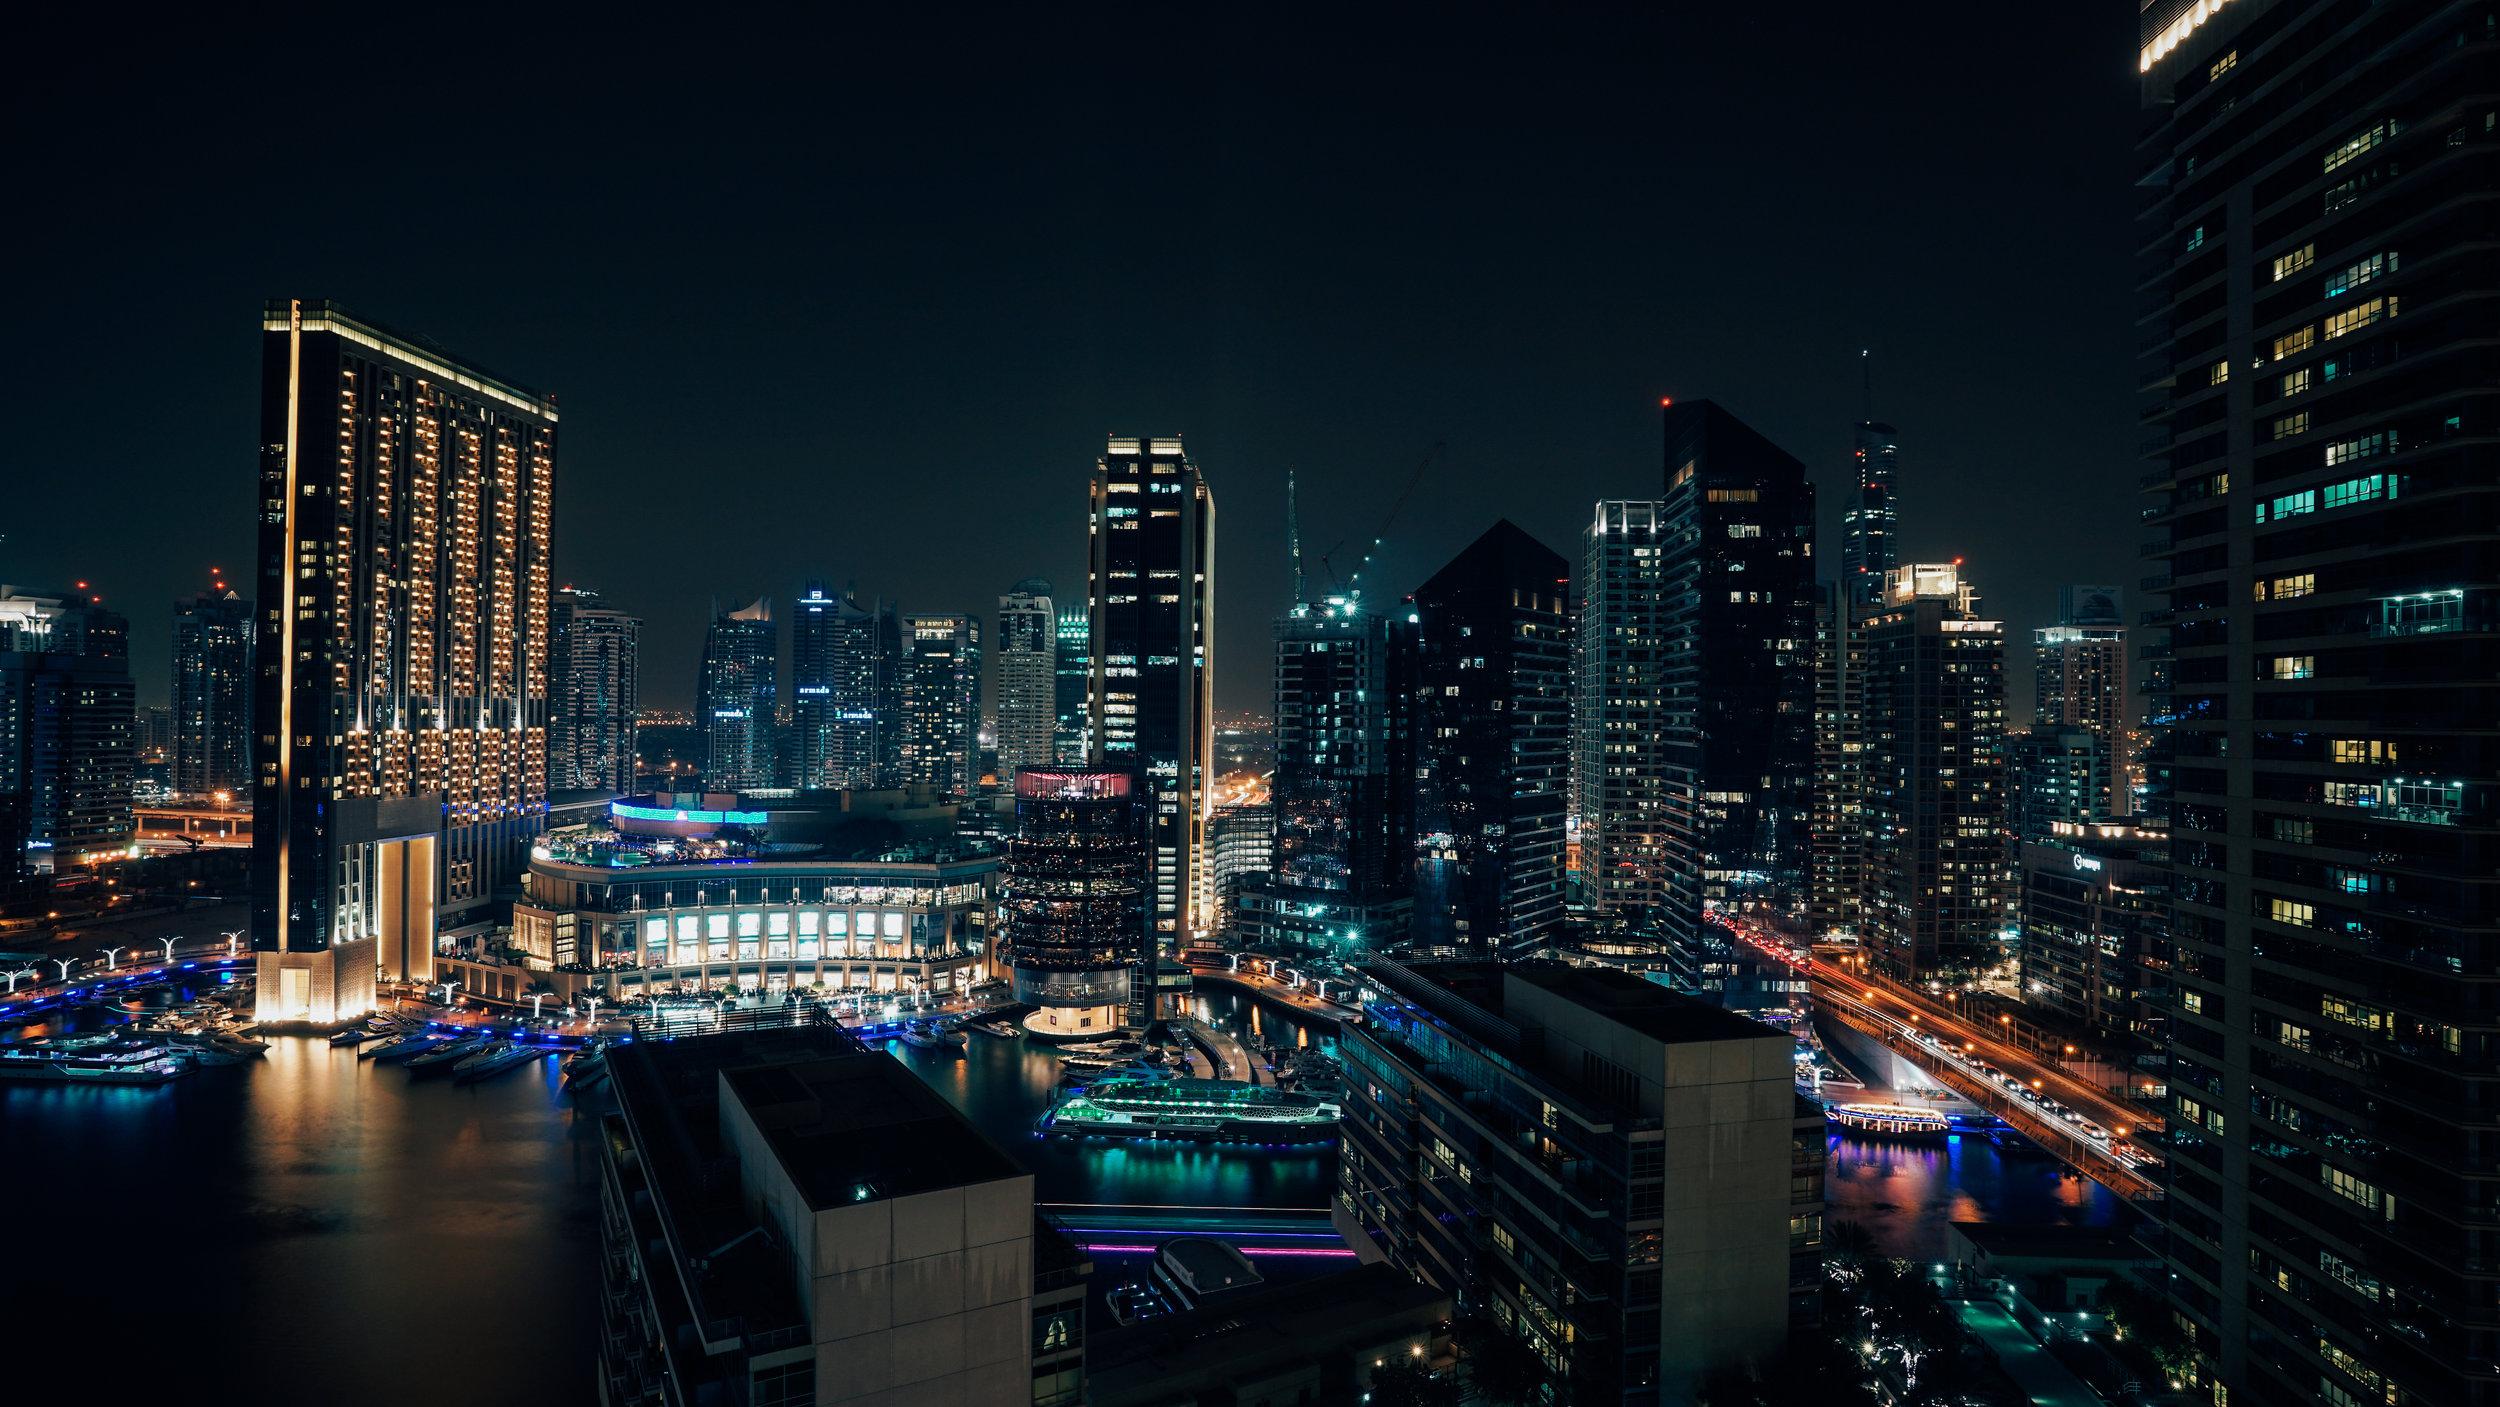 Dubai Marina | Zeiss Lenses